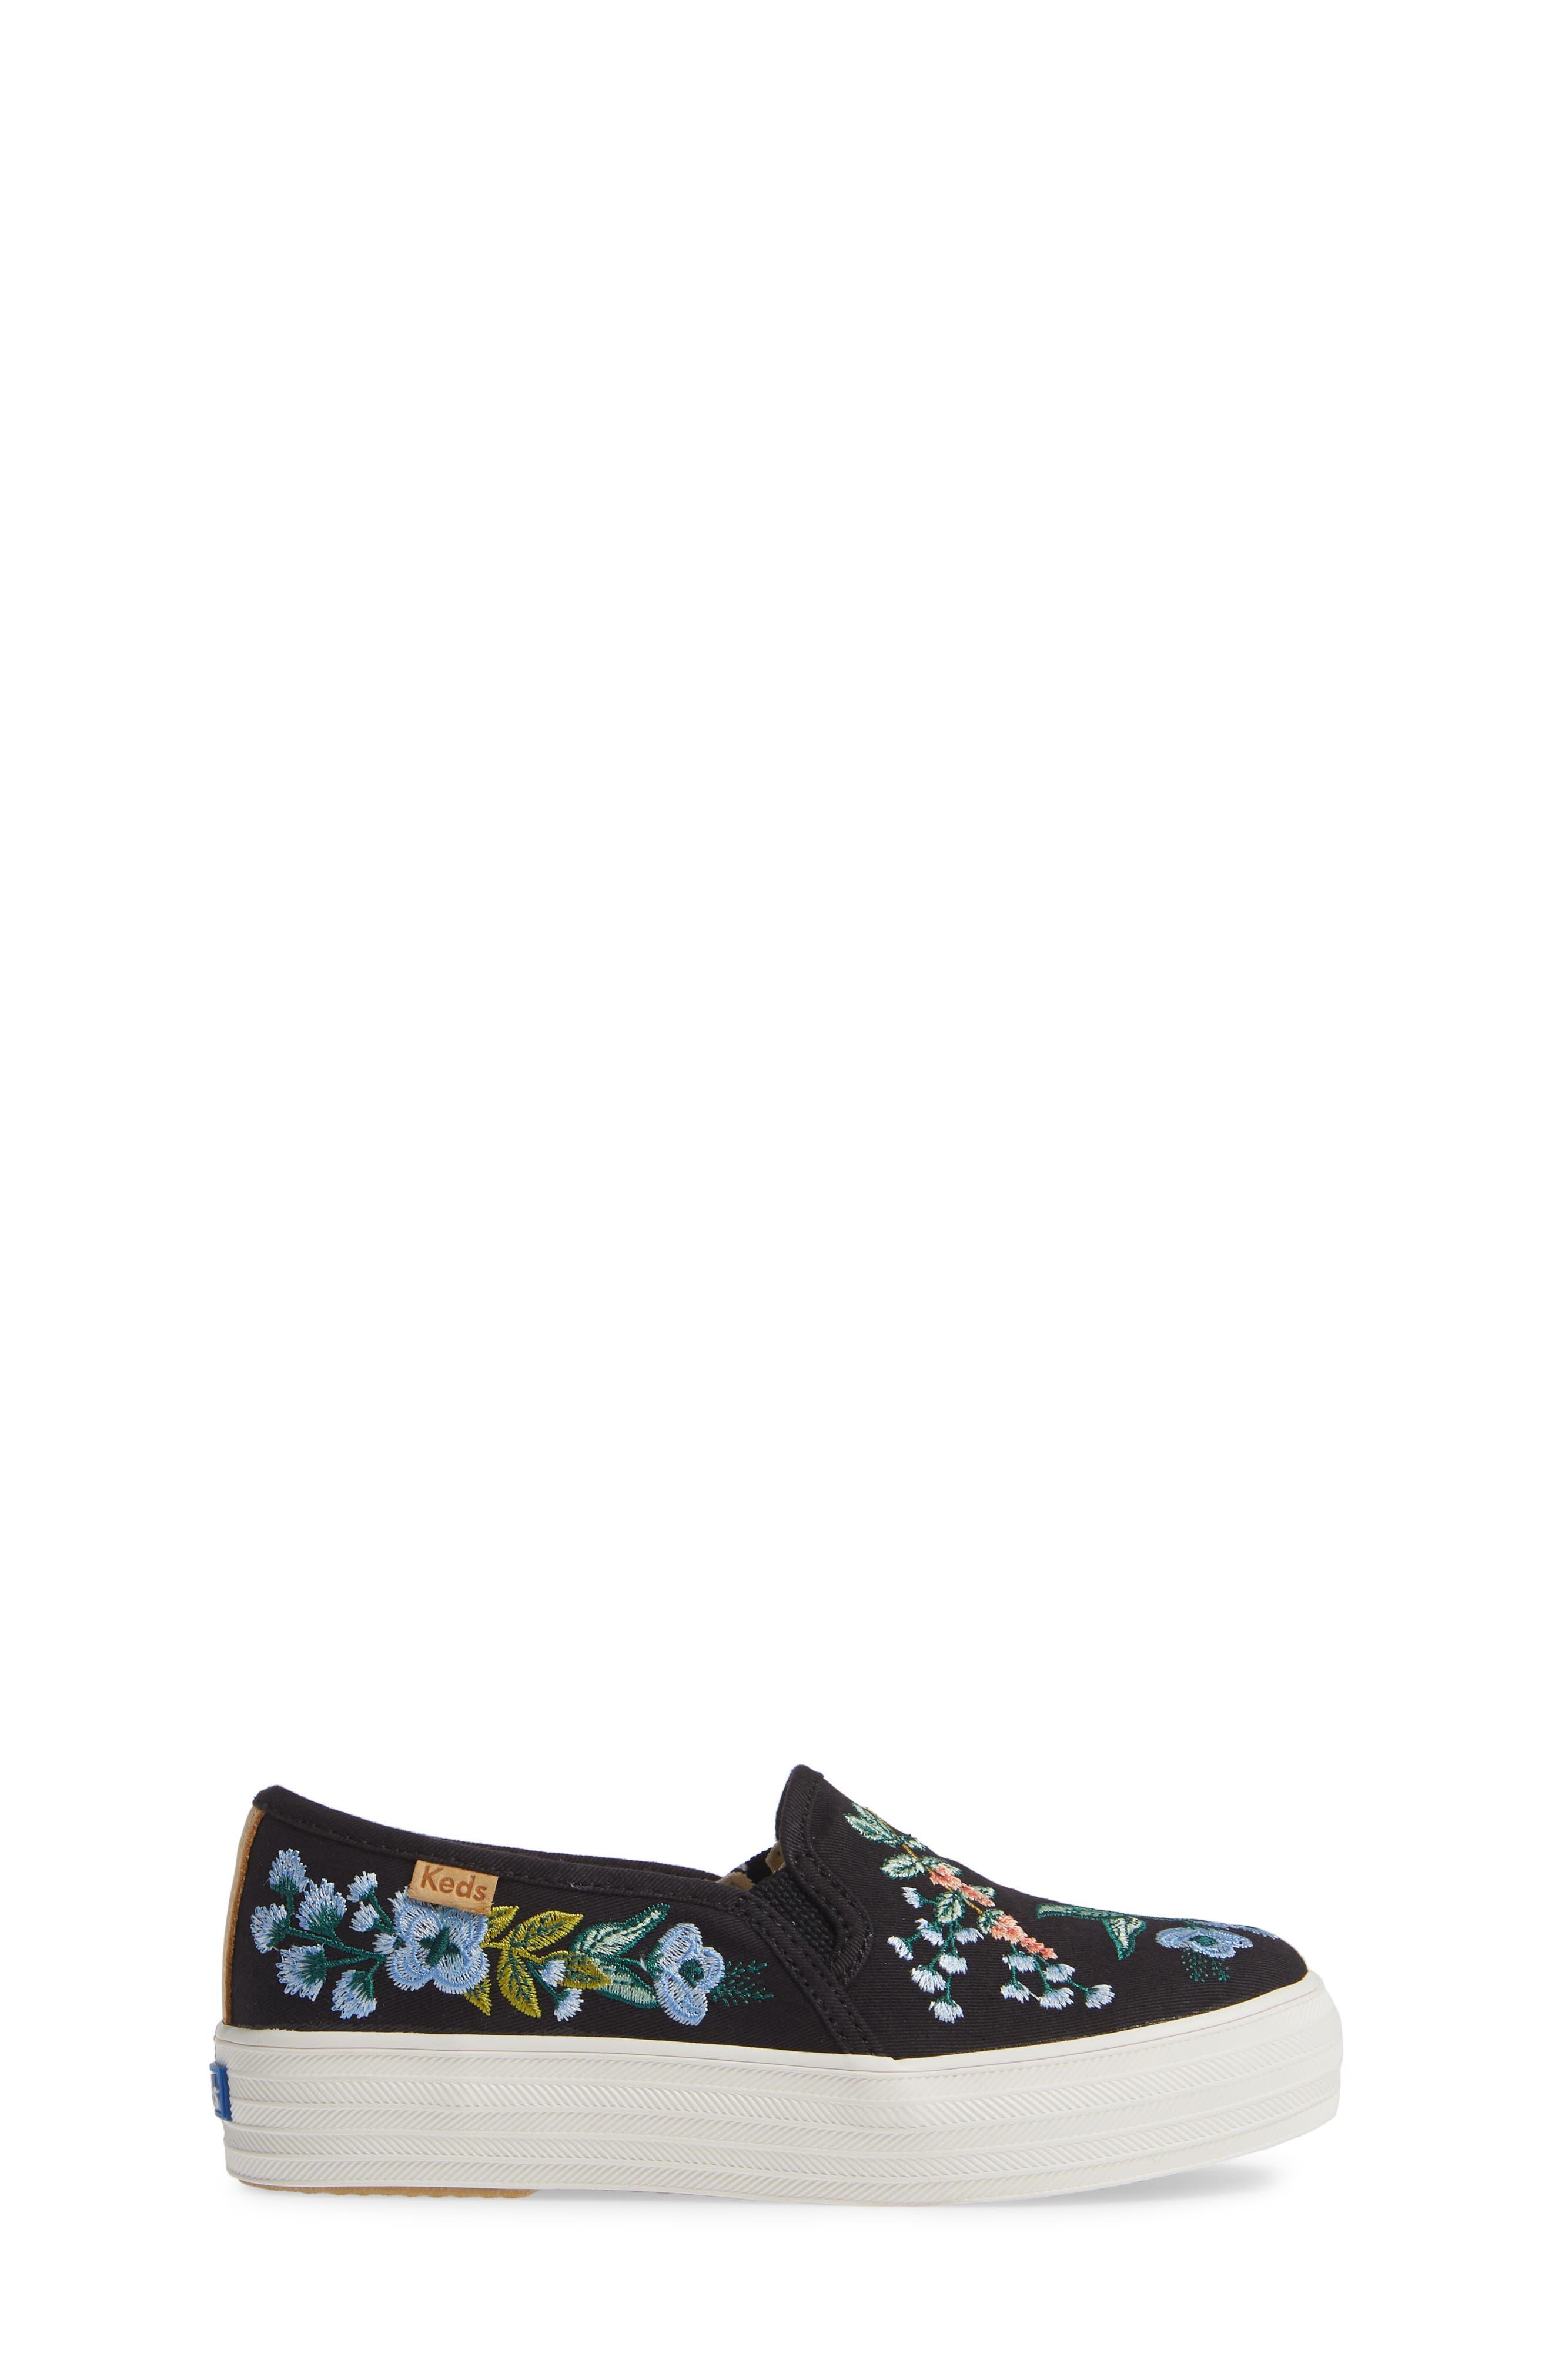 x Rifle Paper Co. Birch Triple Decker Slip-On Sneaker,                             Alternate thumbnail 3, color,                             HERB GARDEN